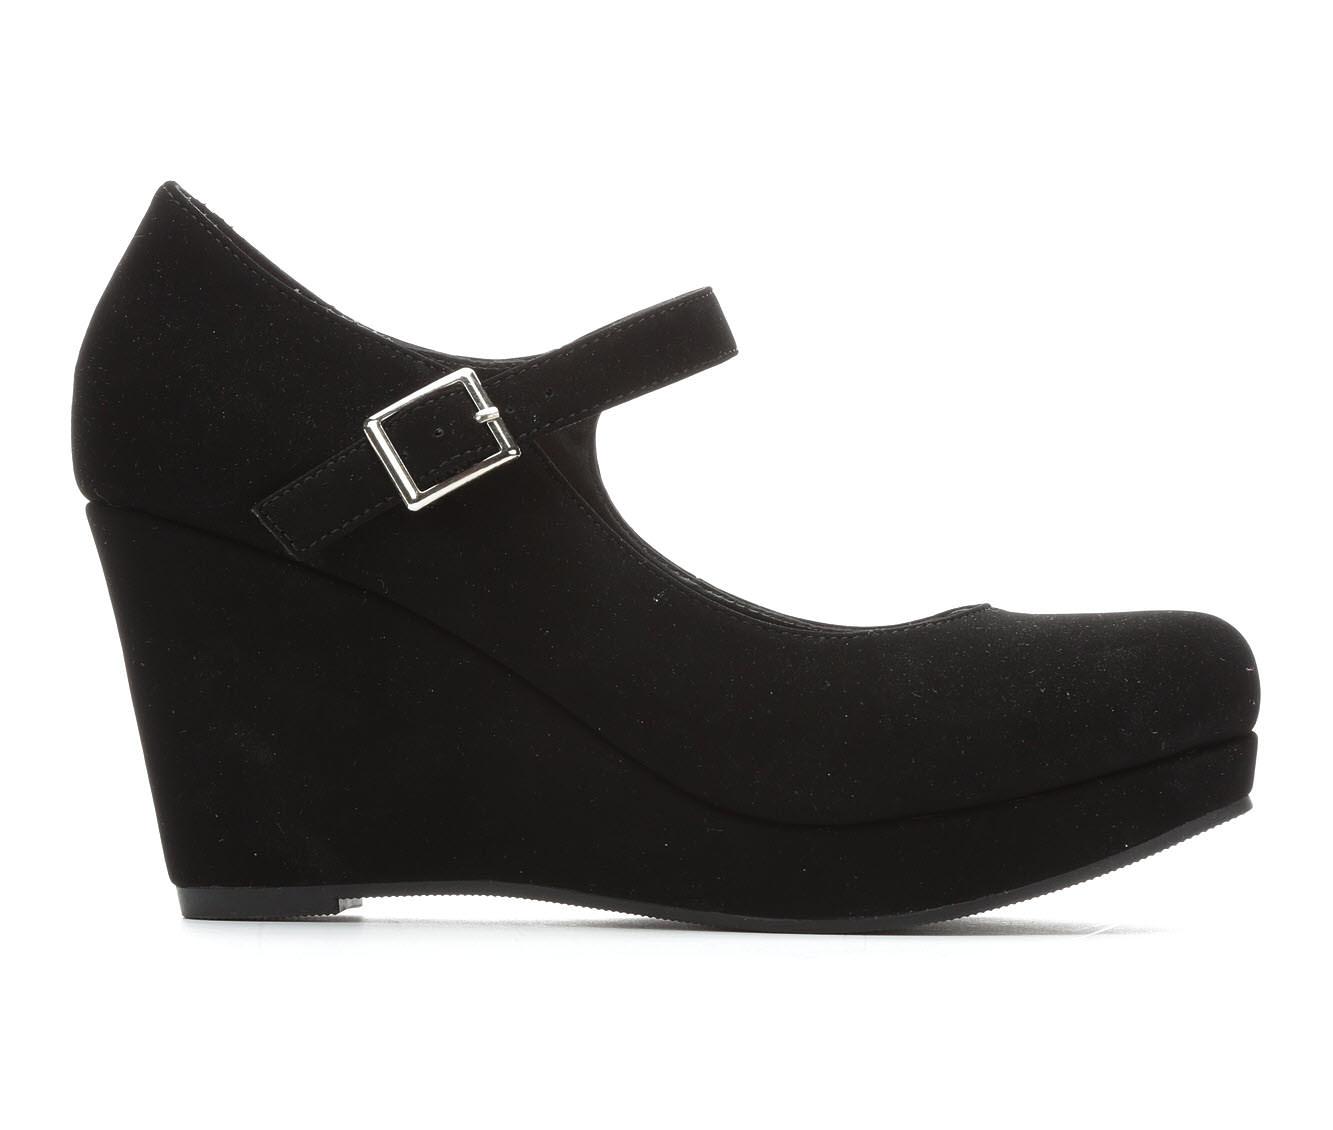 Y-Not Mallory Women's Dress Shoe (Black Faux Leather)